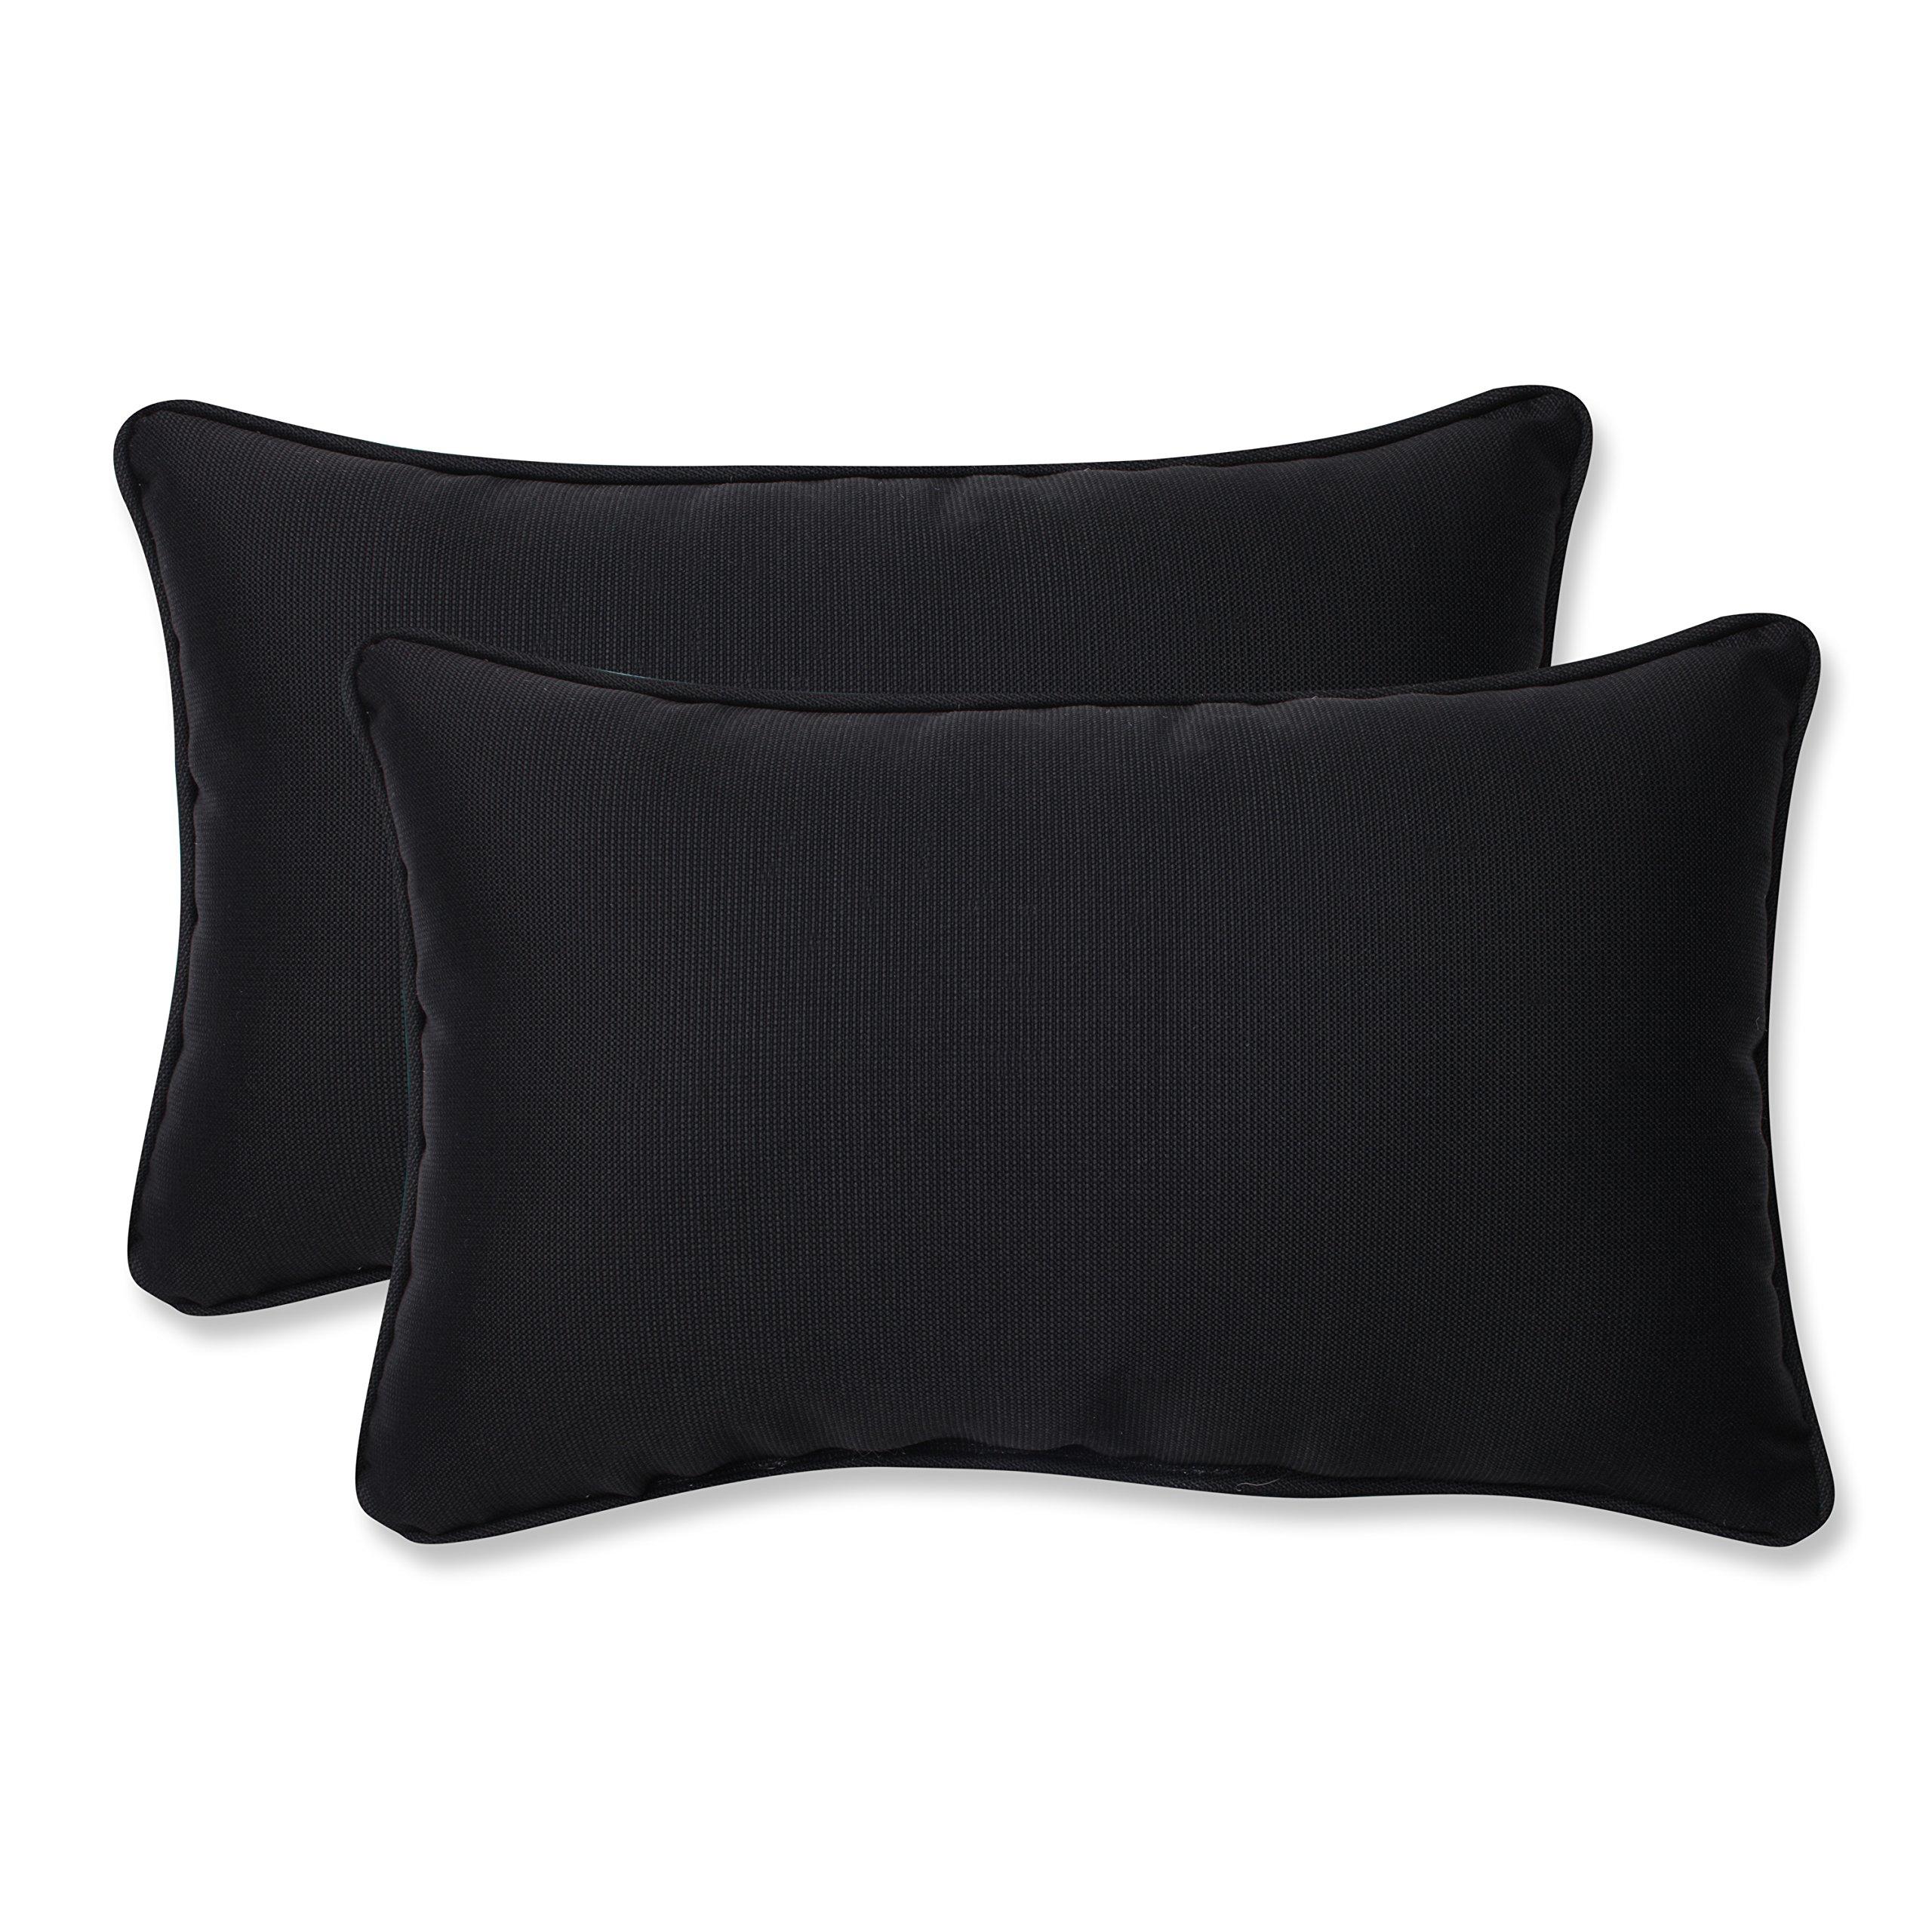 Pillow Perfect Outdoor Fresco Corded Rectangular Throw Pillow, Black, Set of 2 by Pillow Perfect (Image #1)